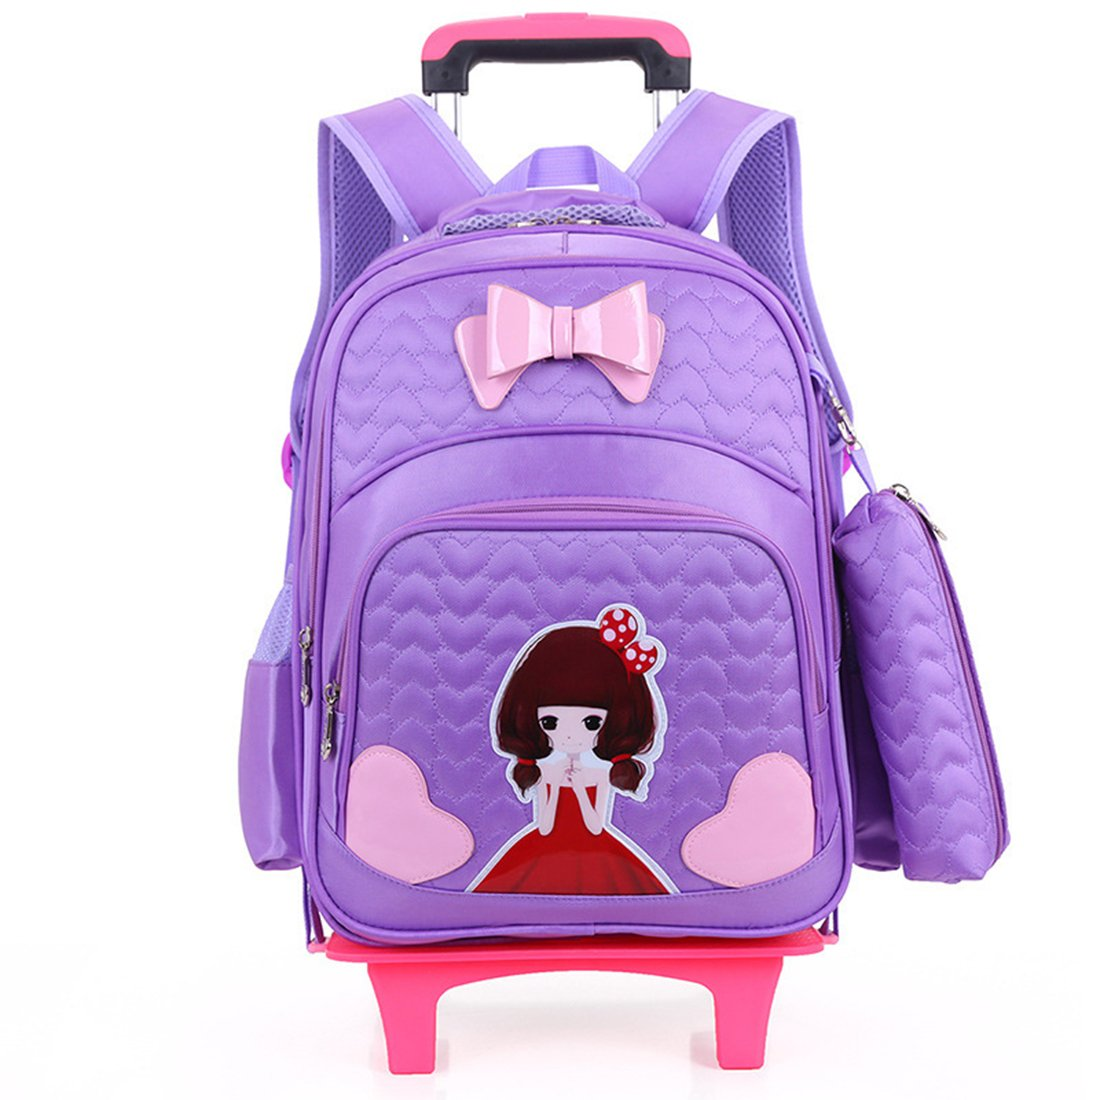 YYF Kids Rolling Backpack Trolley Schoolbag Shoulder Bag With Wheels